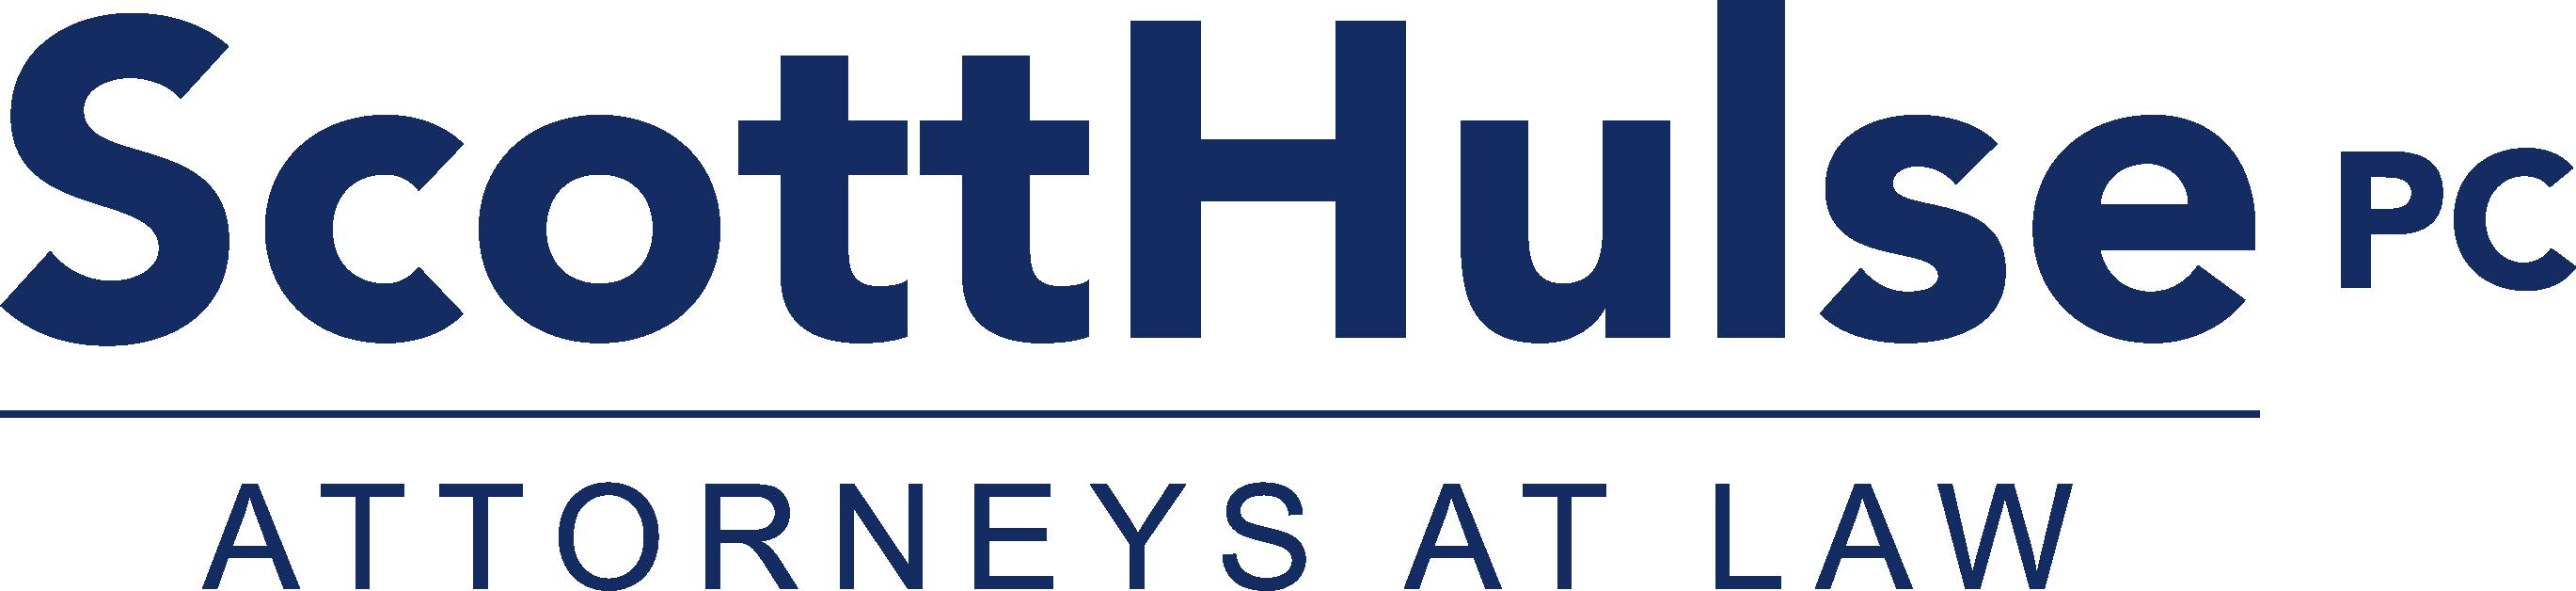 Scott Hulse Attorneys At Law - Logo (white background dark blue)(2)